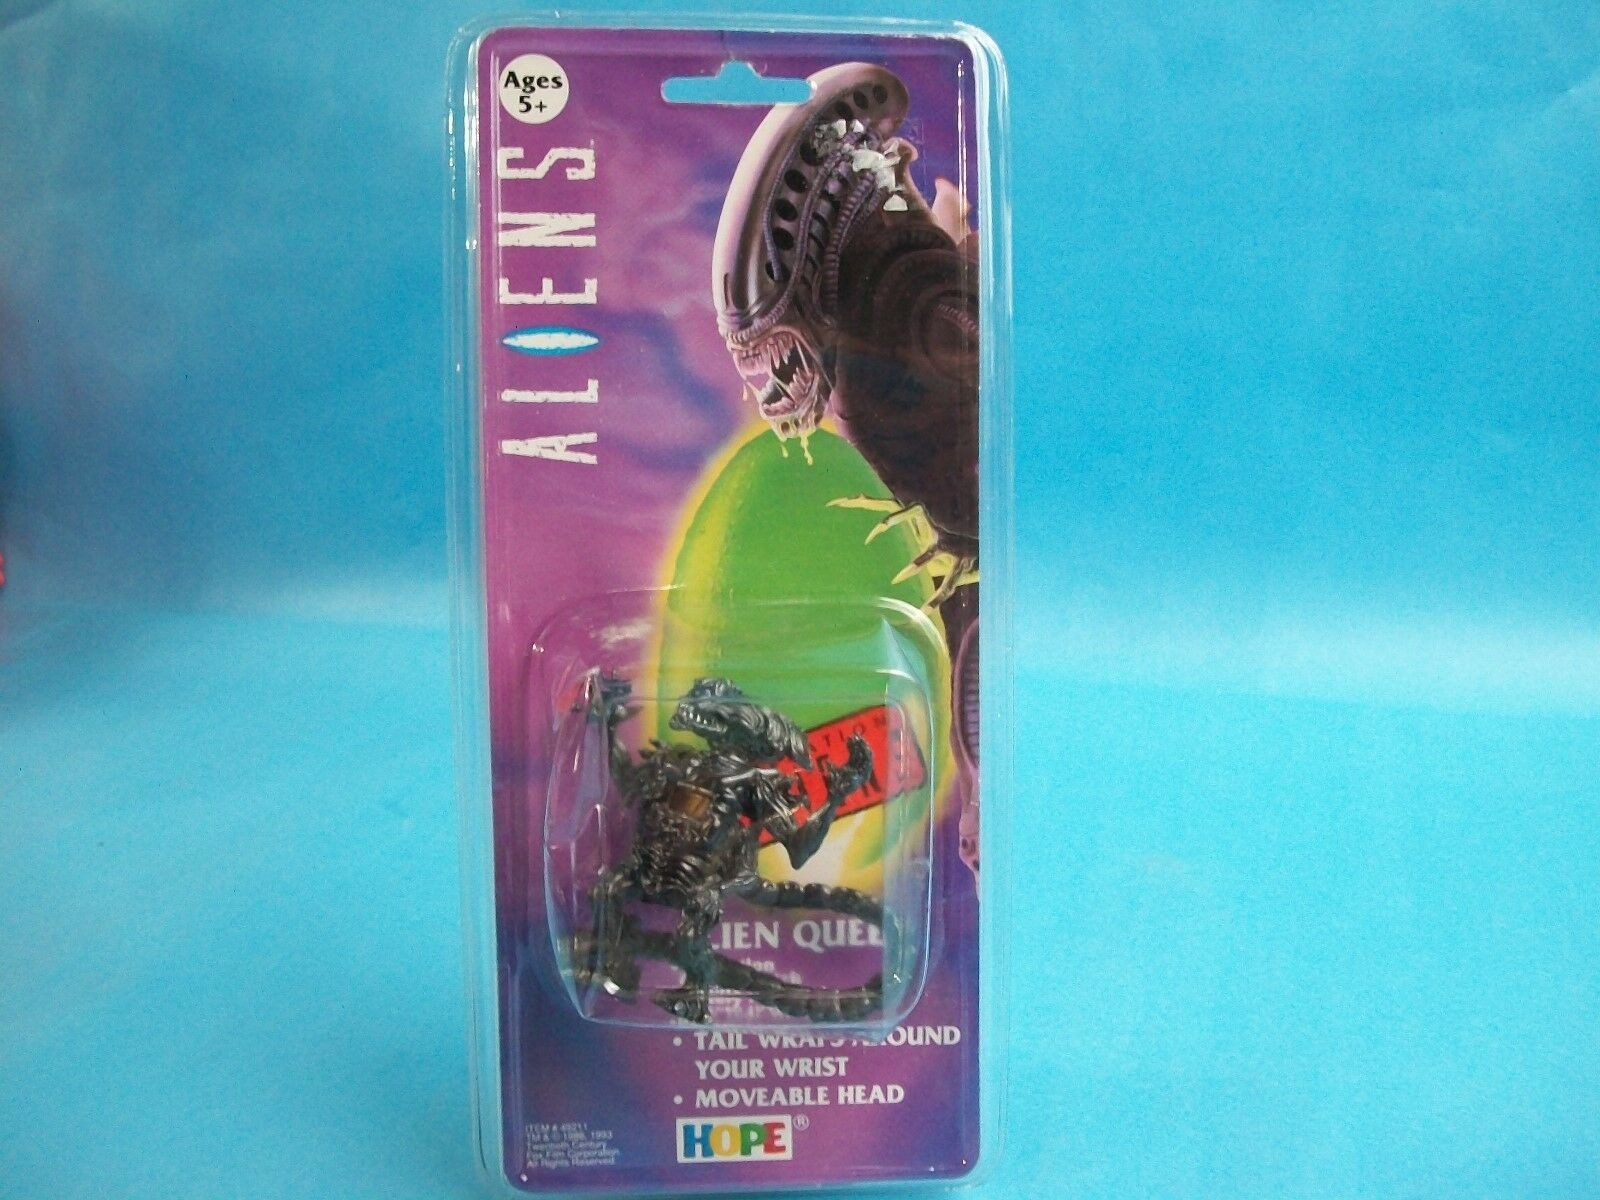 Aliens Hope Toys & Twentieth Century Fox QUEEN ALIEN Molded Digital Watch (A)